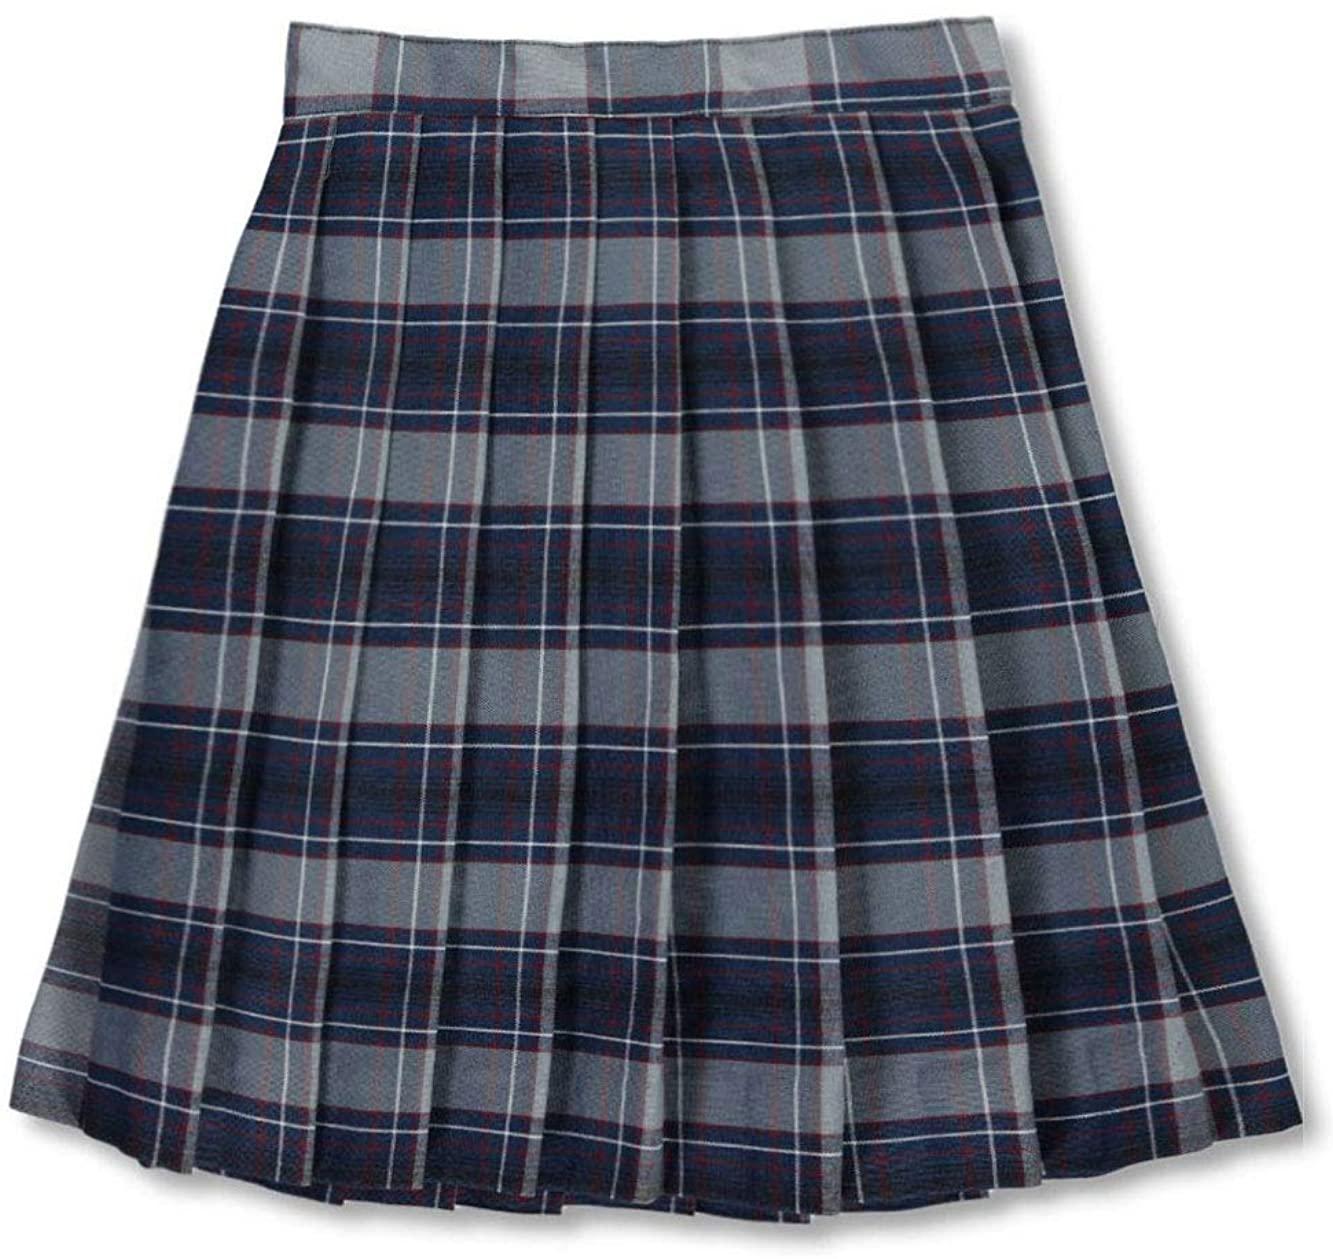 Cookies Big Girls Pleated Skirt - Gray/Royal/Burgundy/whiteplaid #82, 12